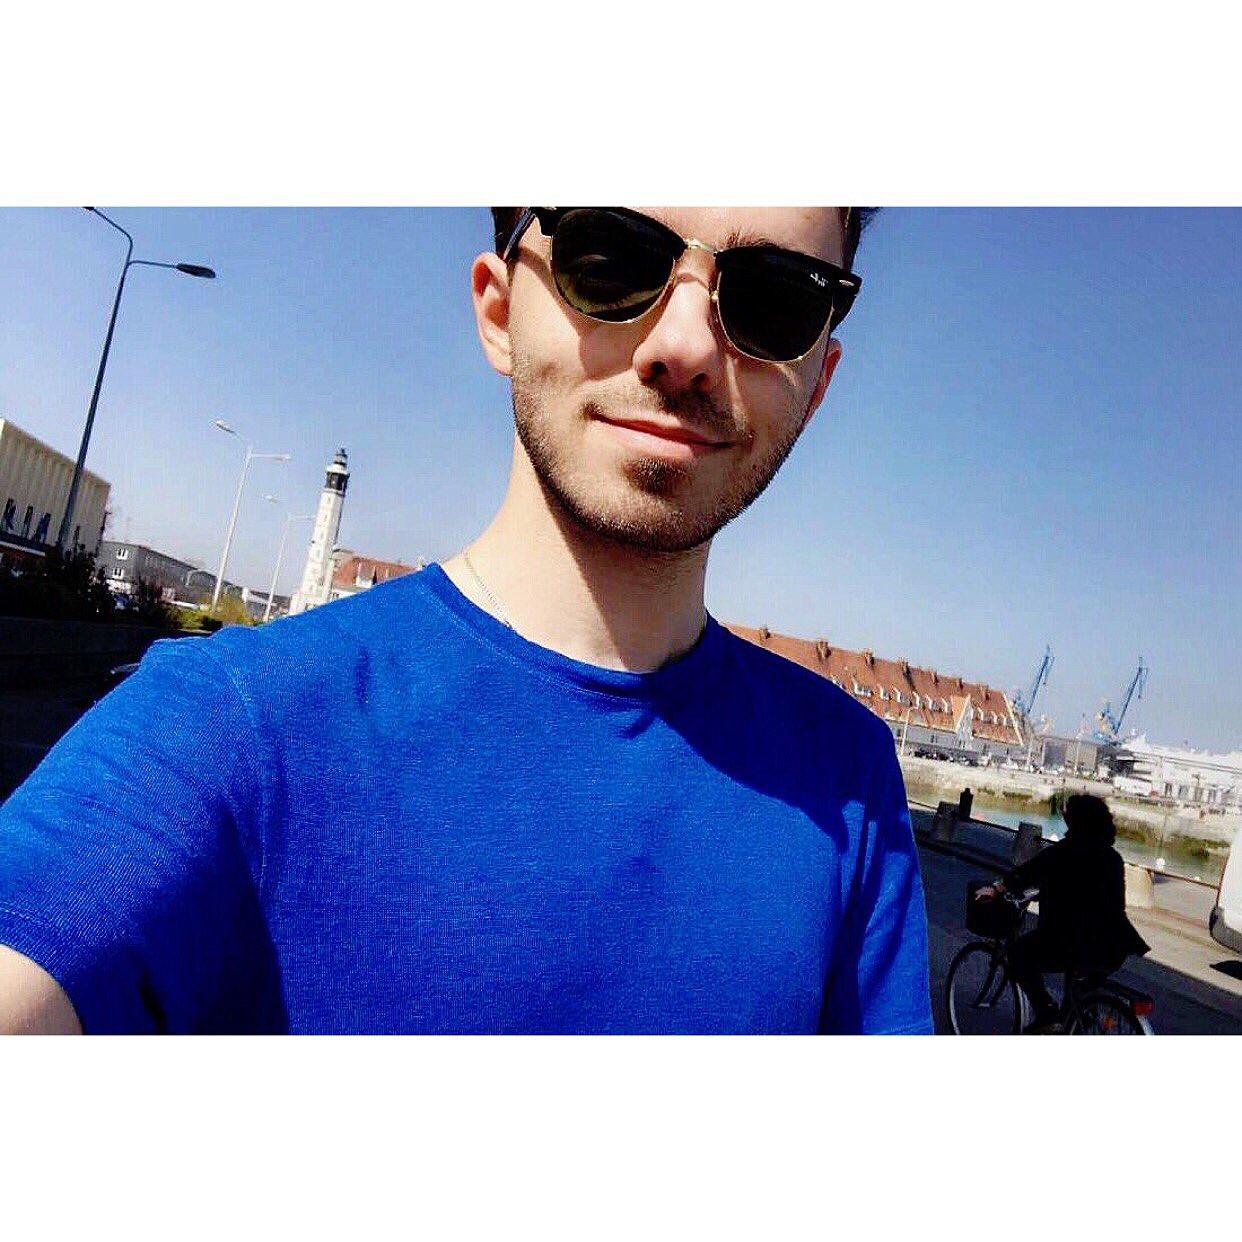 Me ft someone on a bike https://t.co/UK8SSqmnHB https://t.co/GSObKJRPfL